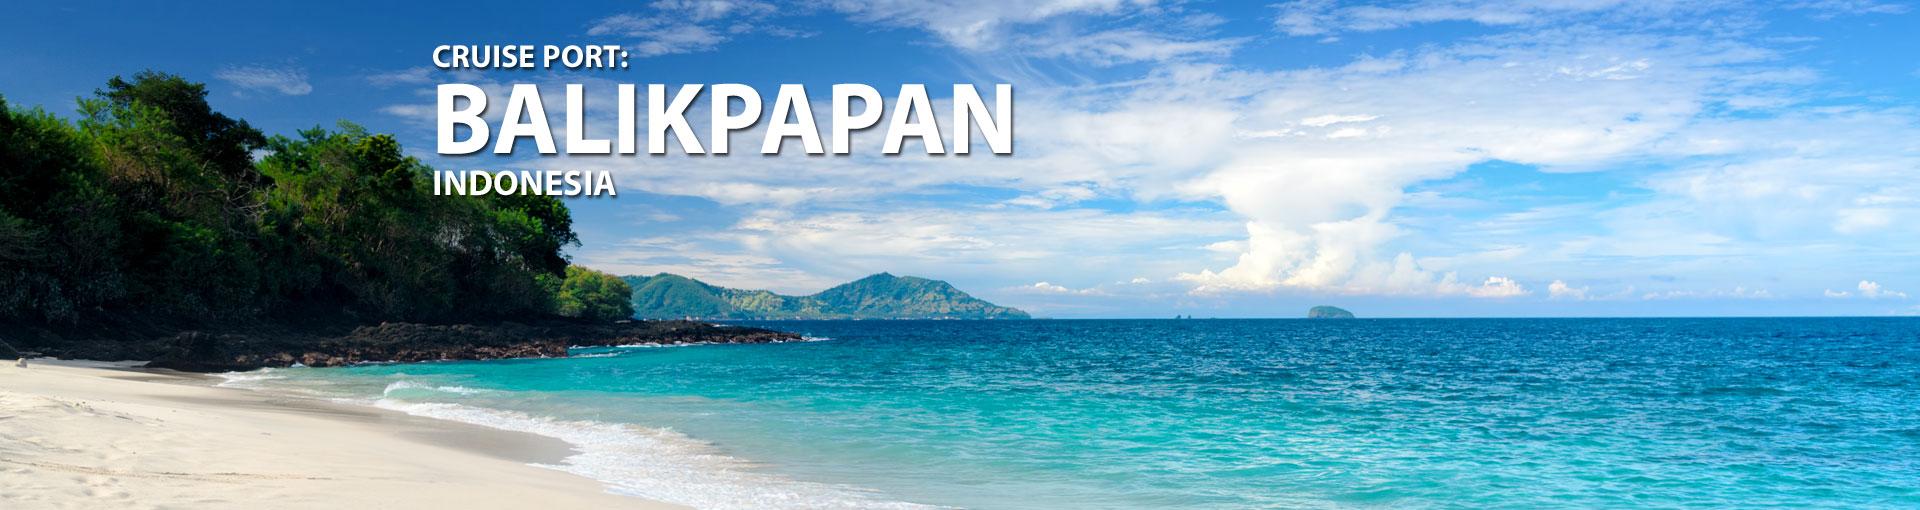 Balikpapan Indonesia  city photos : Balikpapan, Indonesia Cruise Port, 2015 and 2016 Cruises to Balikpapan ...